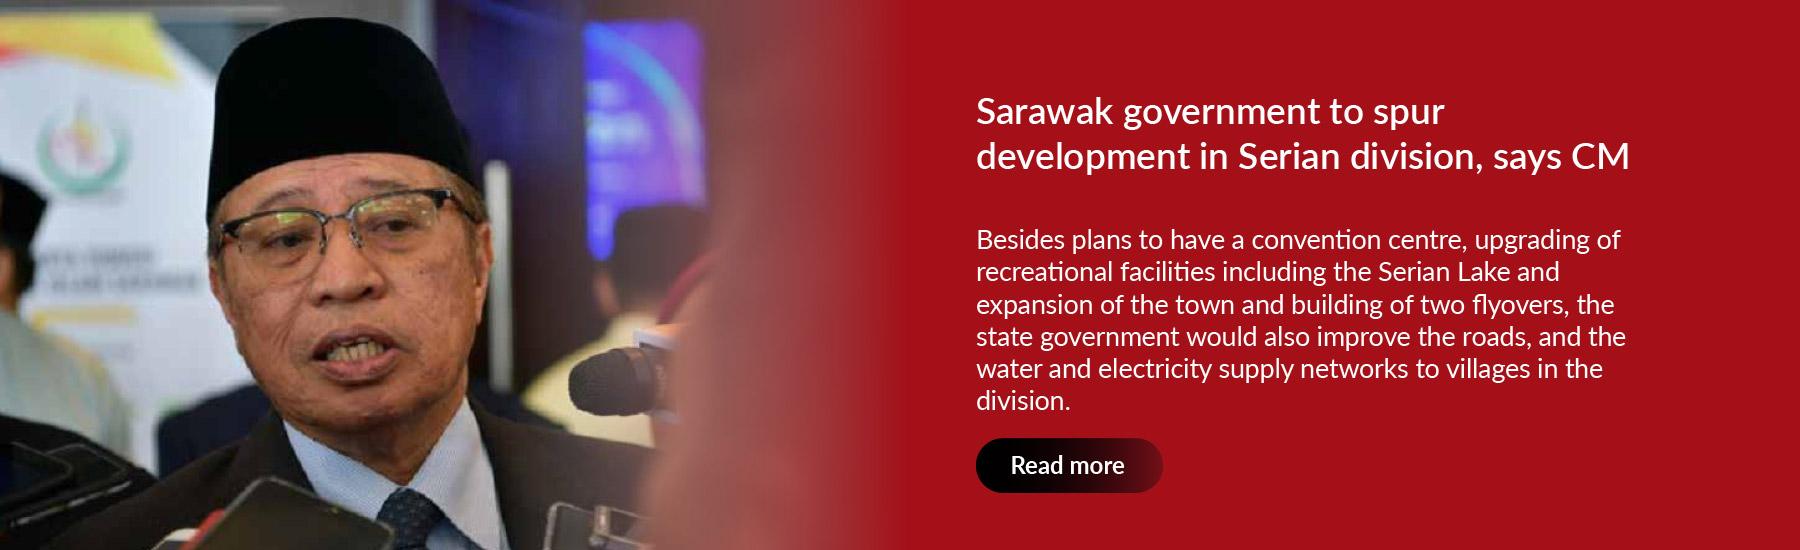 Sarawak govt to spur development in Serian division, says CM